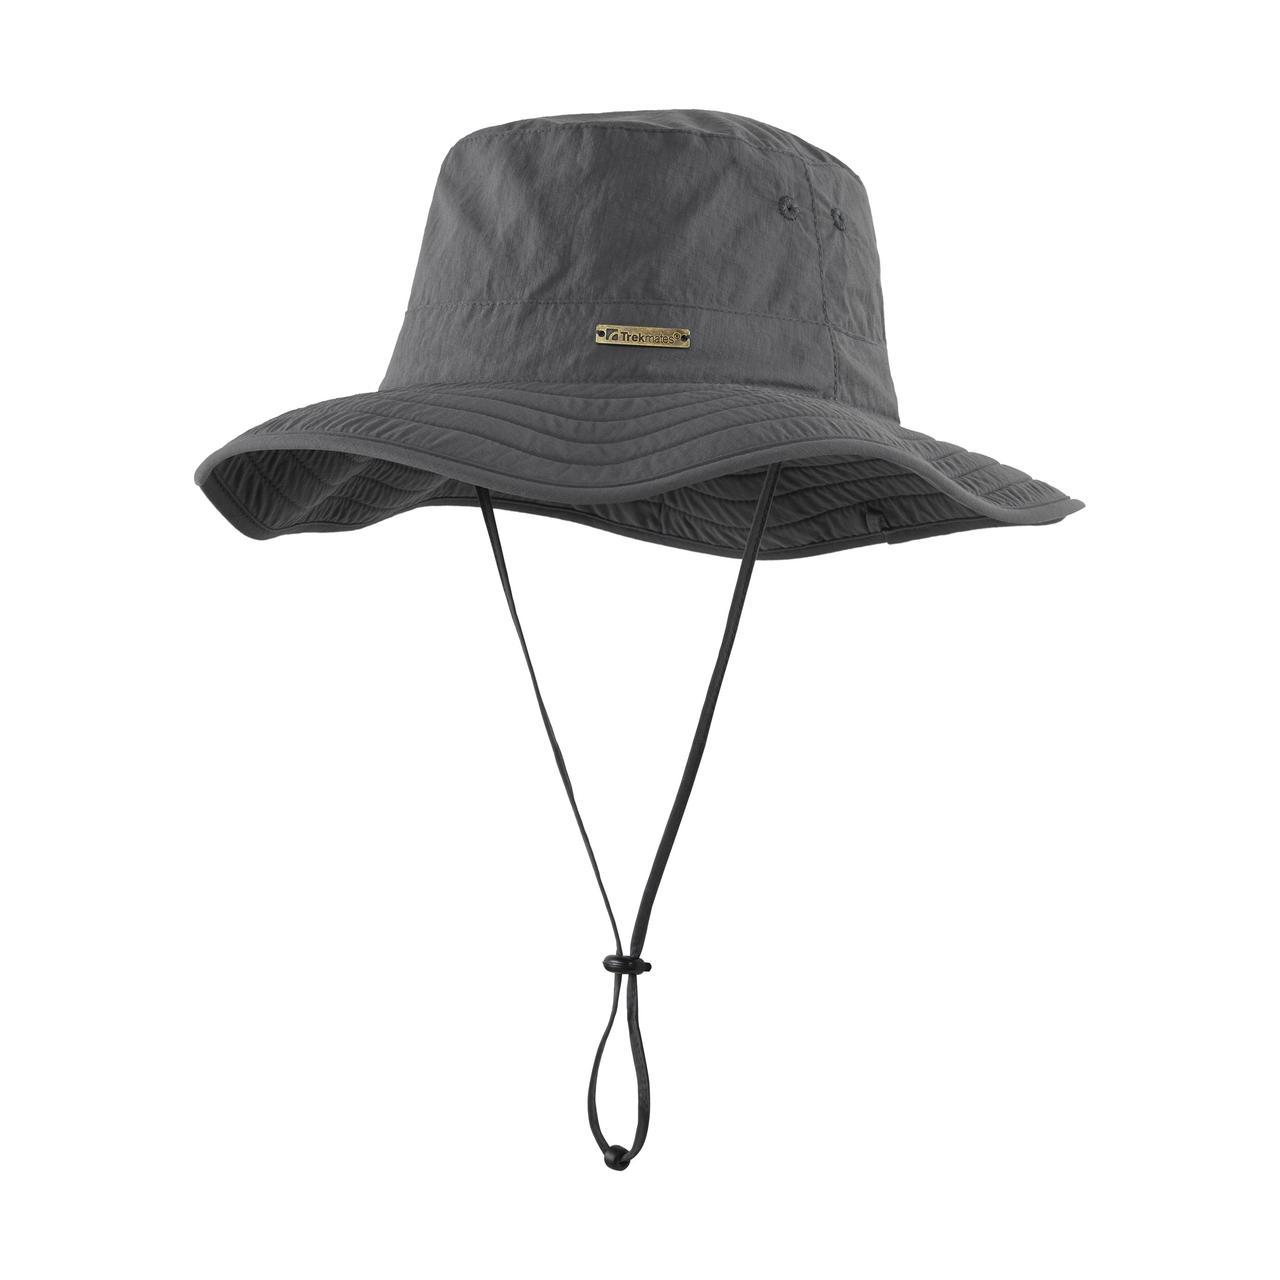 Шляпа Trekmates Gobi Wide Brim Hat, Ash, S/M